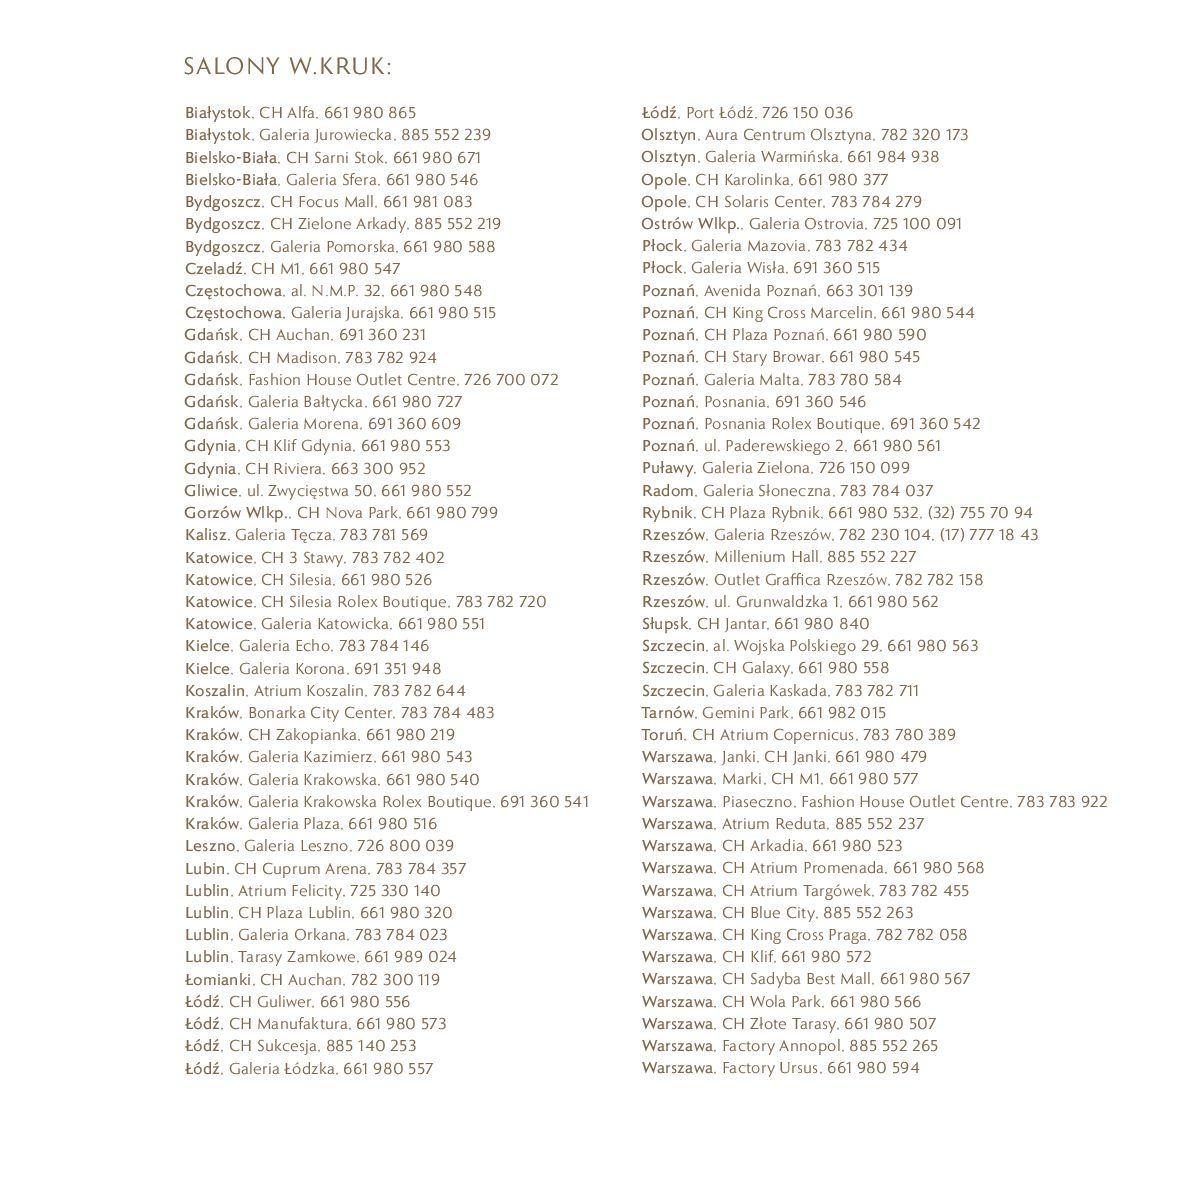 Gazetka W. KRUK: Katalog - Akcesoria 2021-02-17 page-90